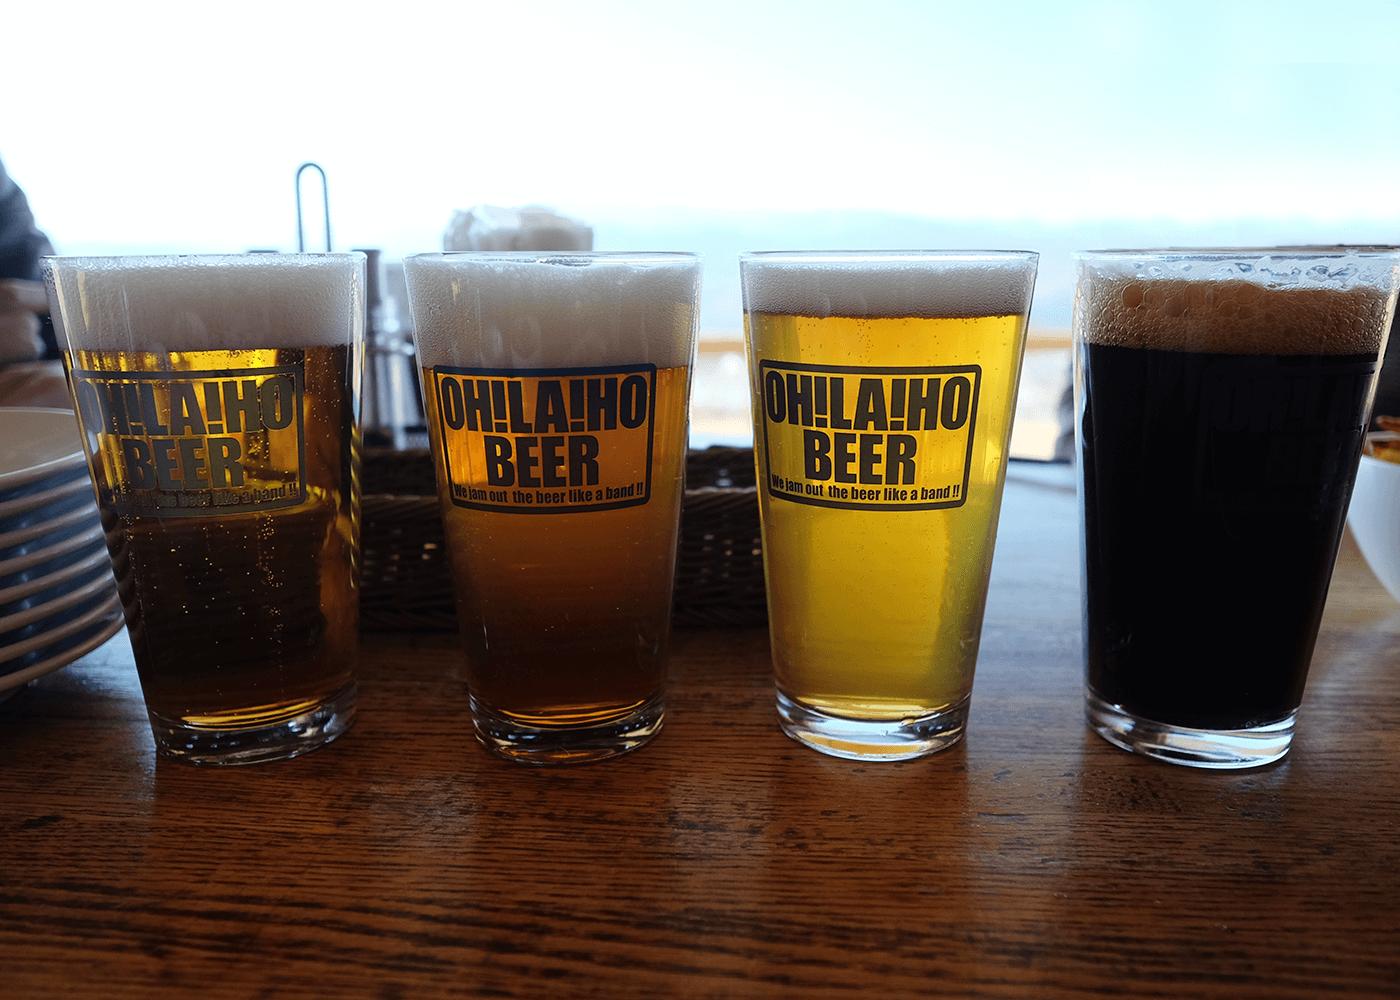 Brewery & Restaurant OH!LA!HO(ブルワリーレストラン オラホ)